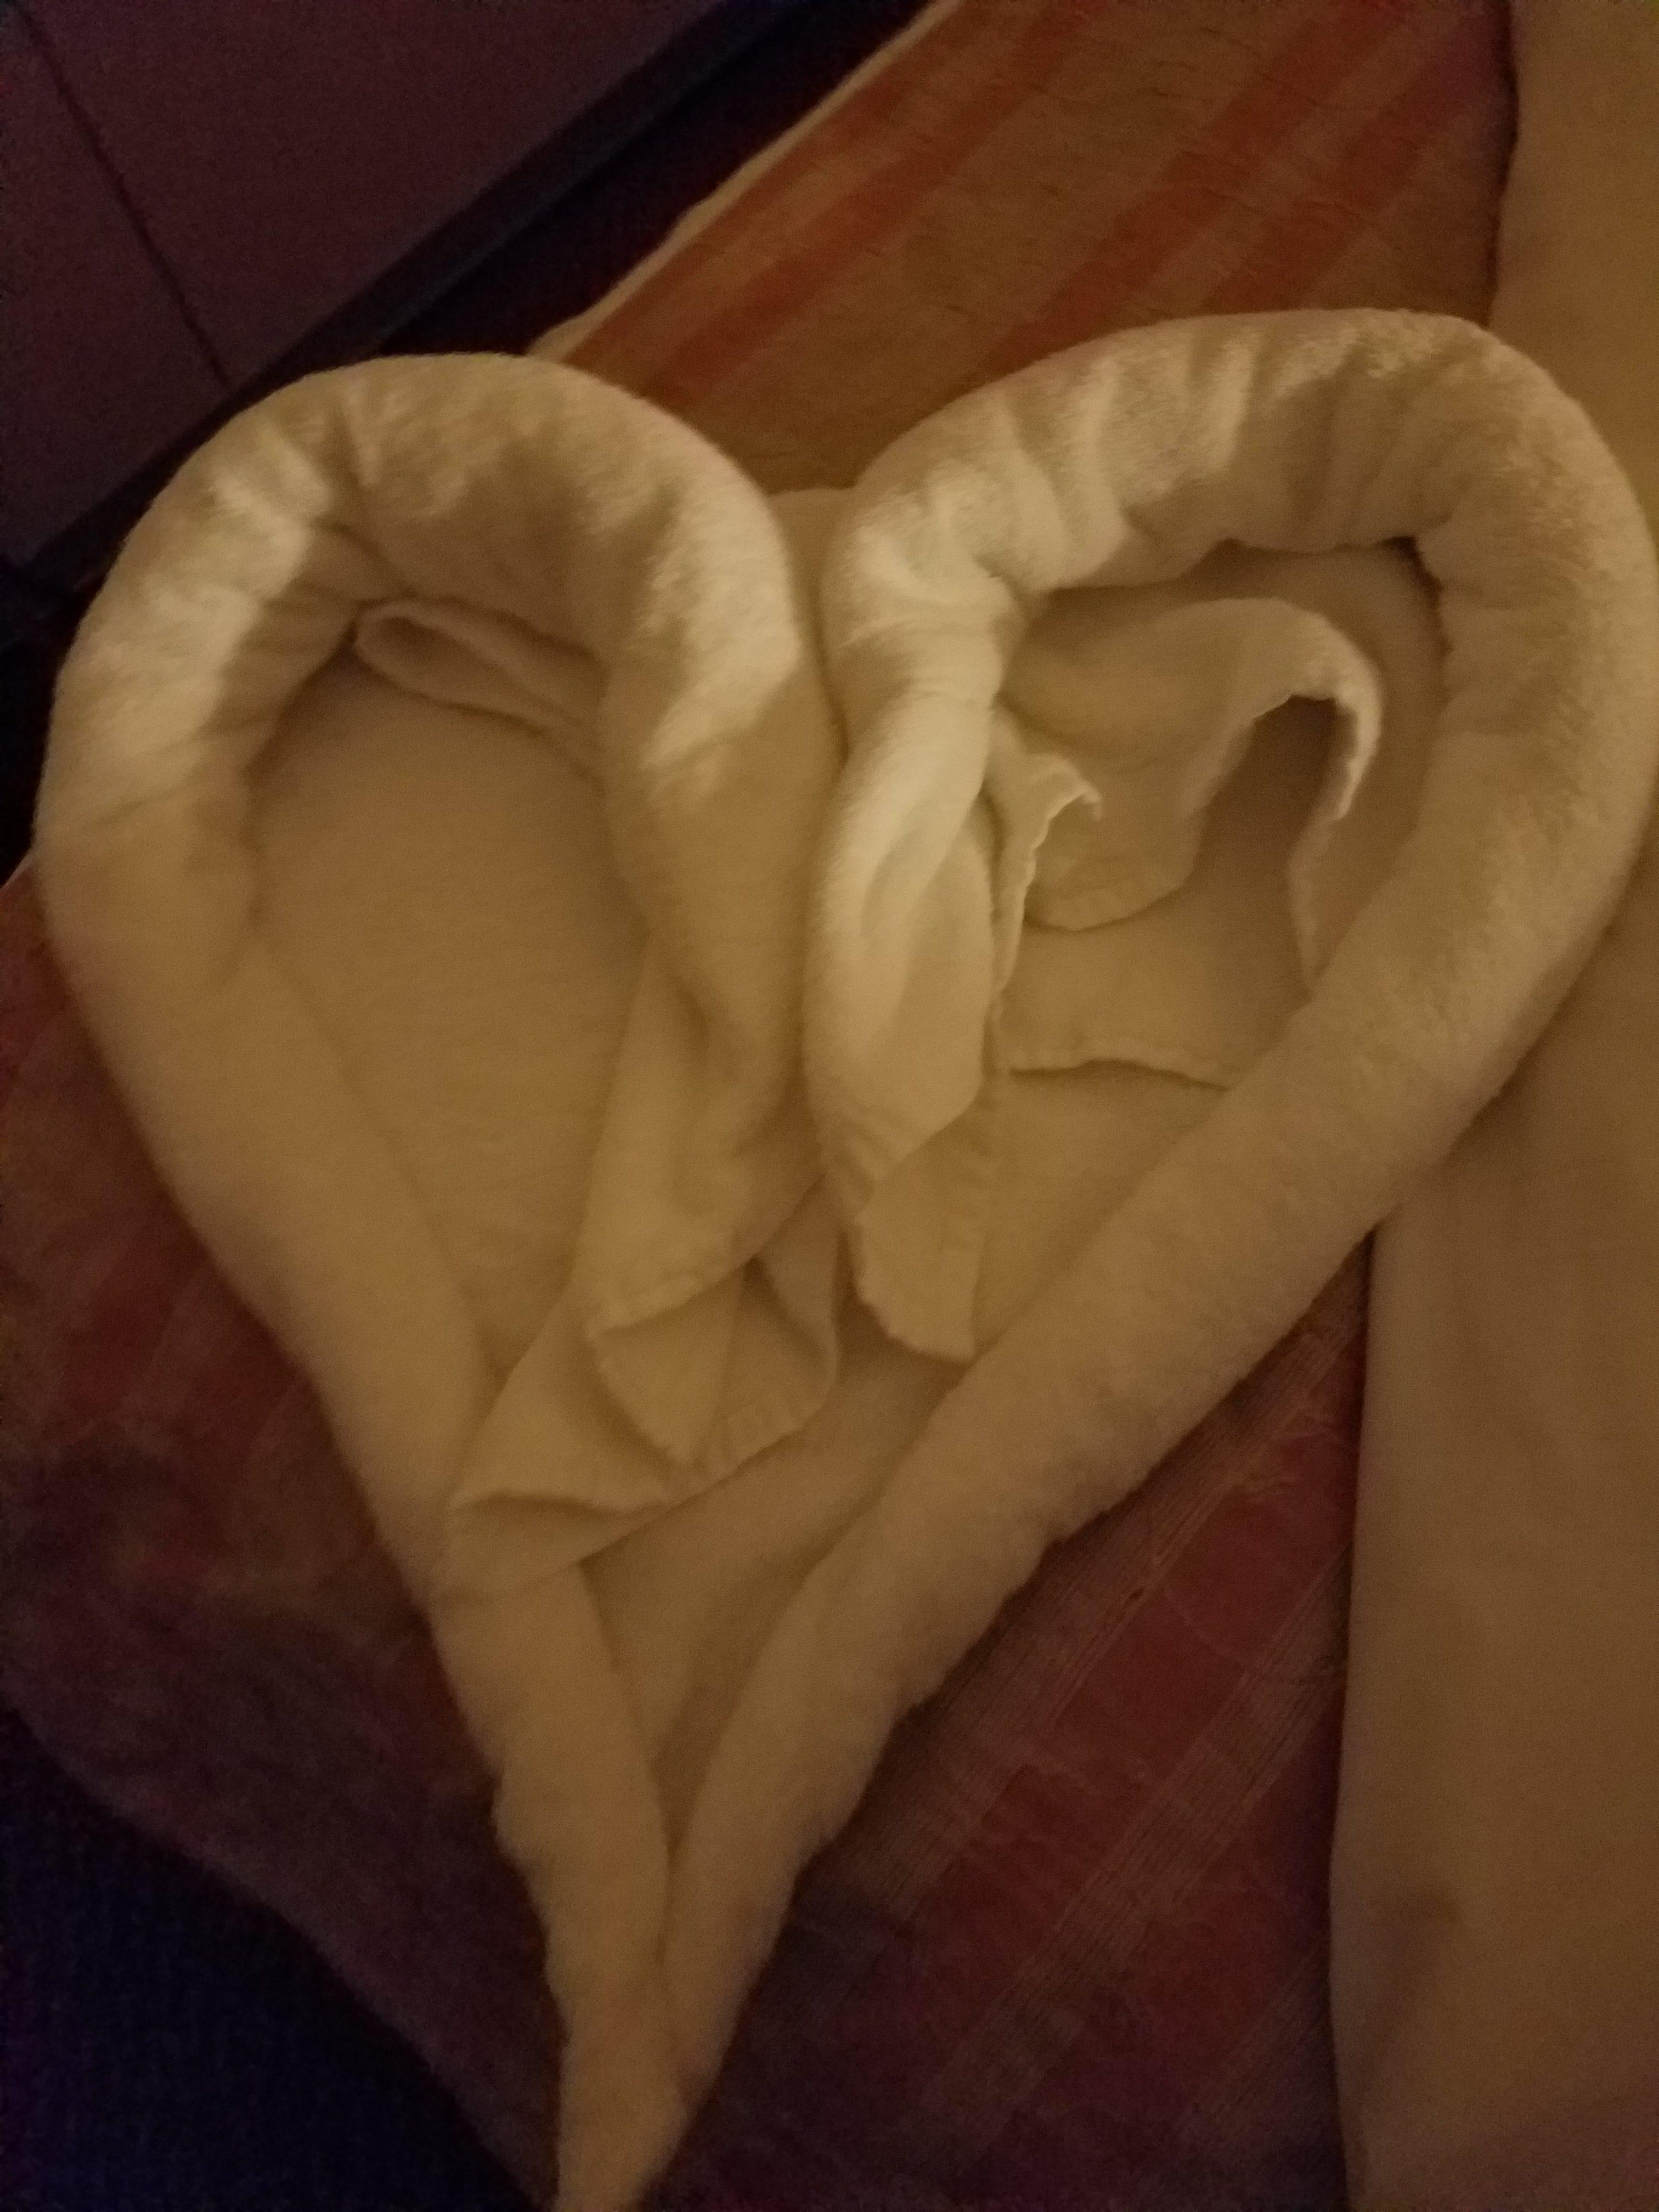 Towel Heart